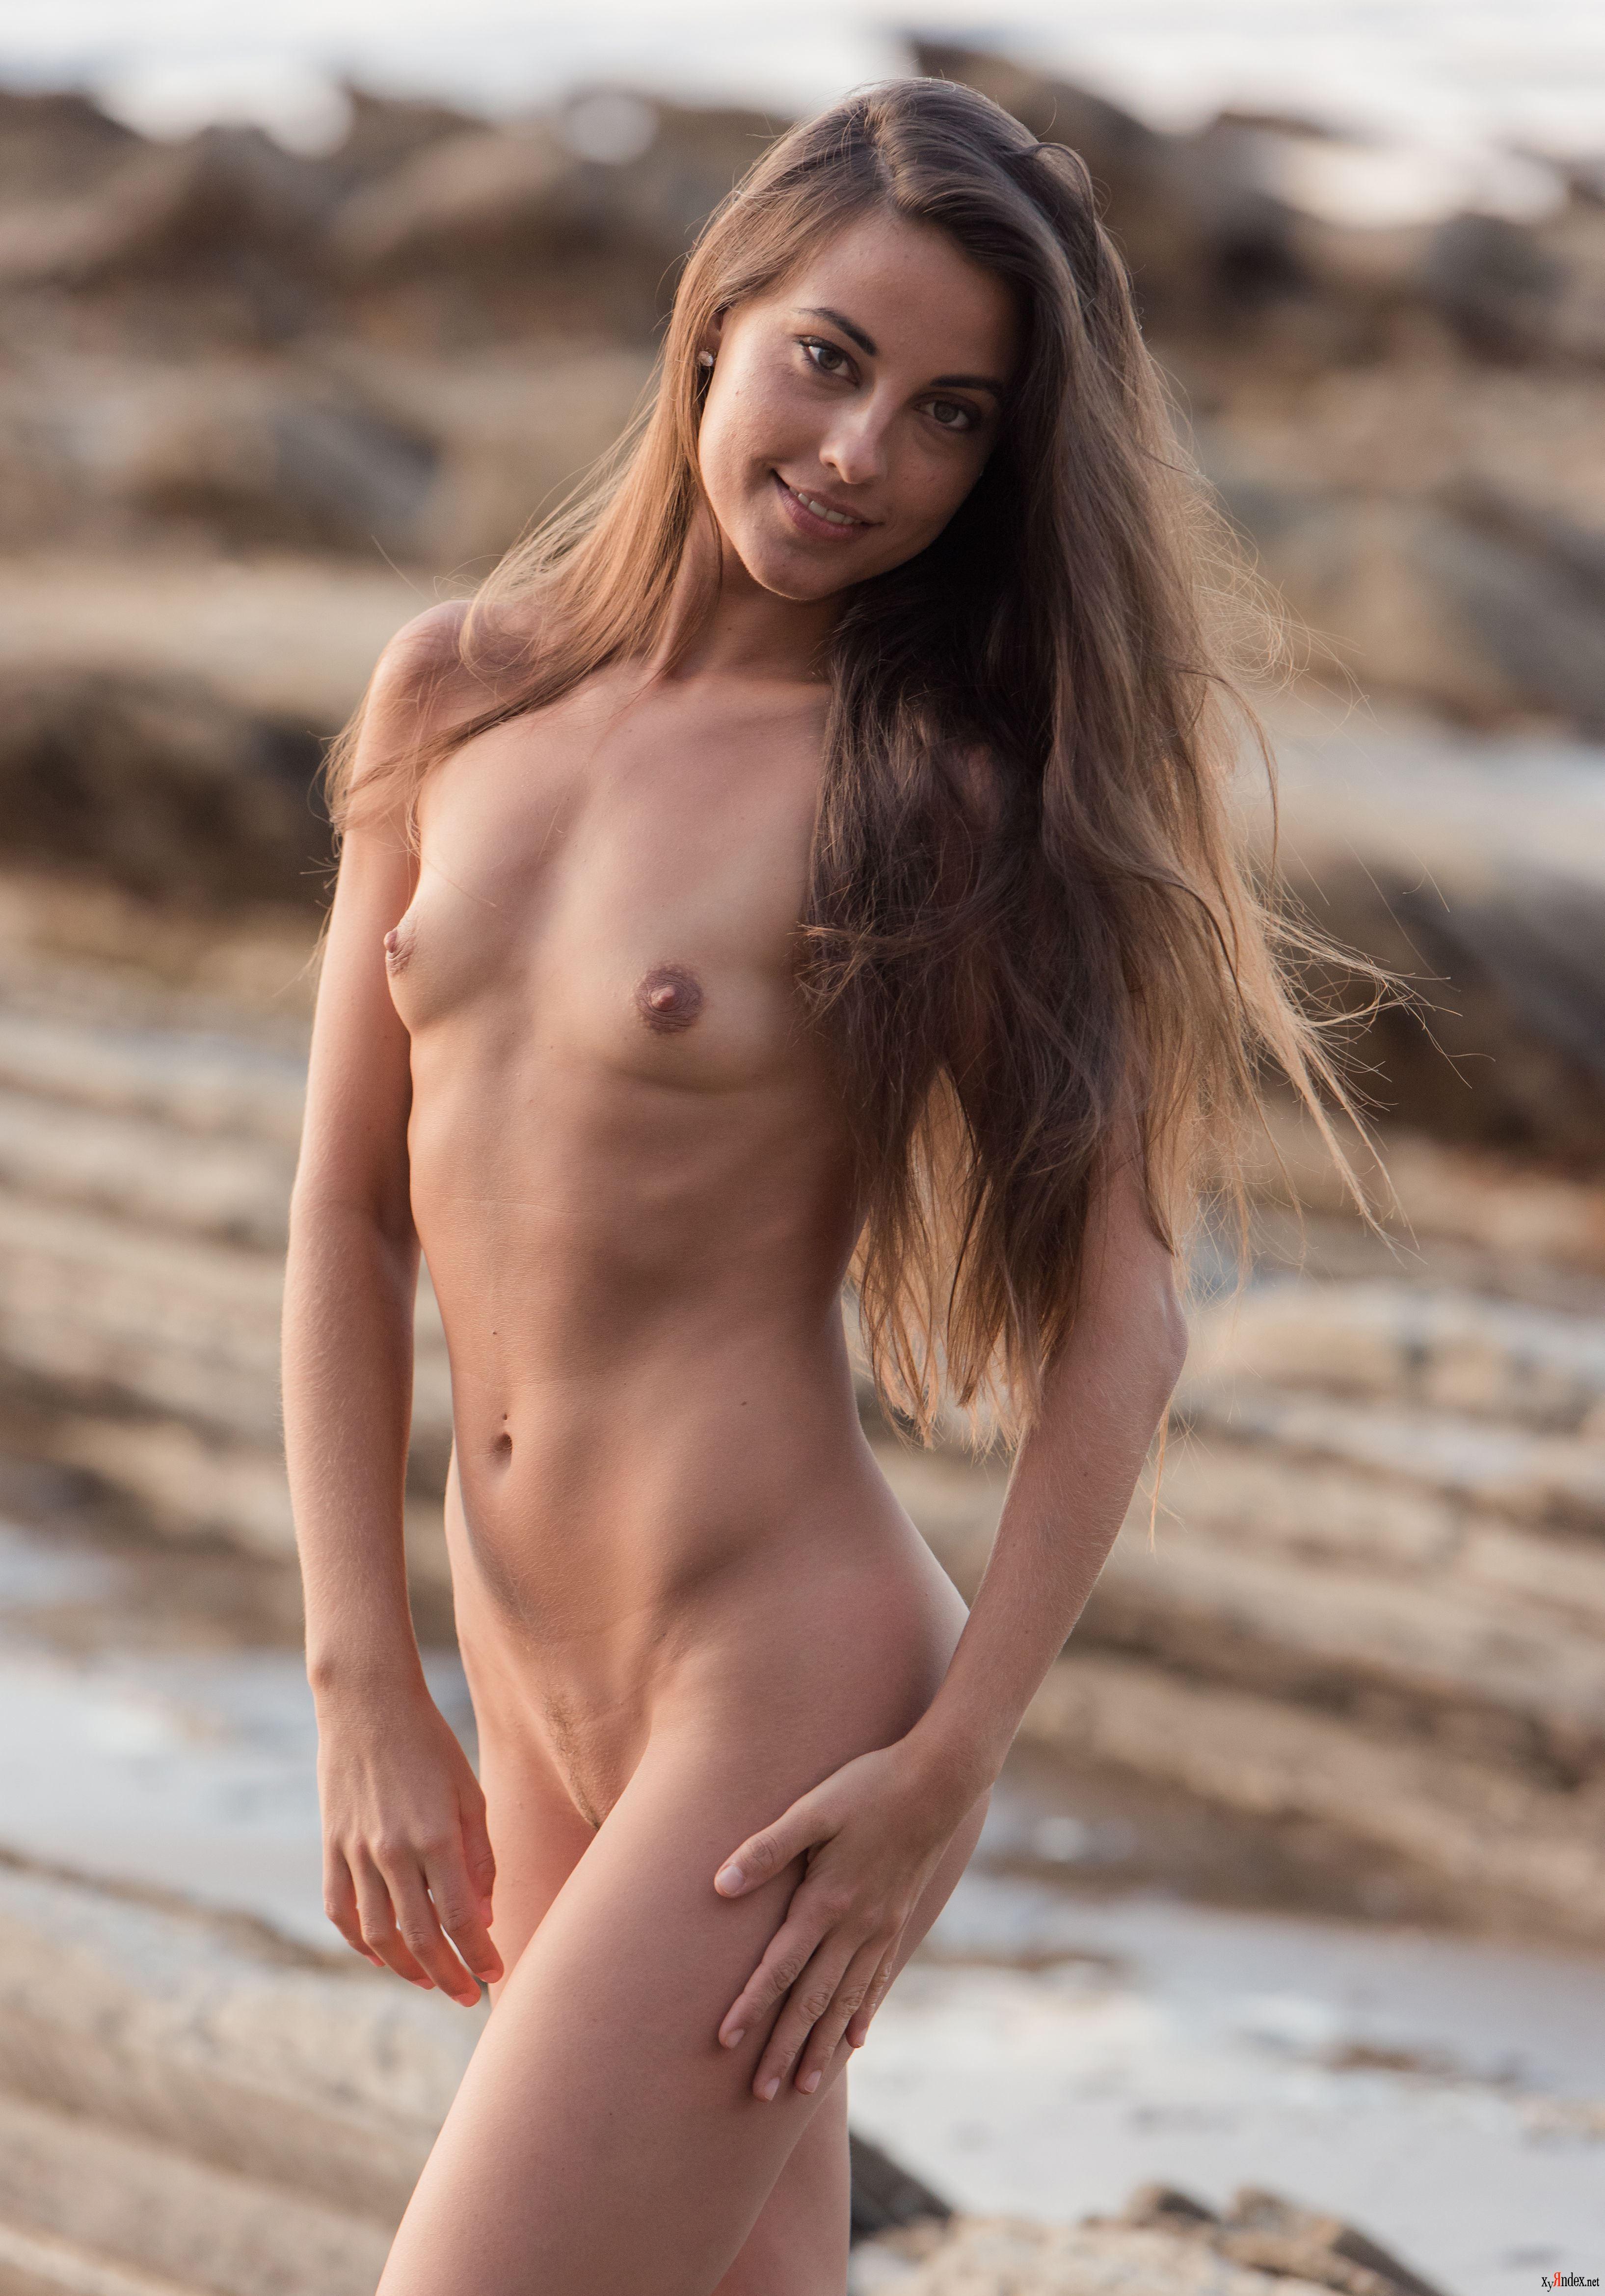 real-orgasm-completely-naked-pics-cruz-porn-kim